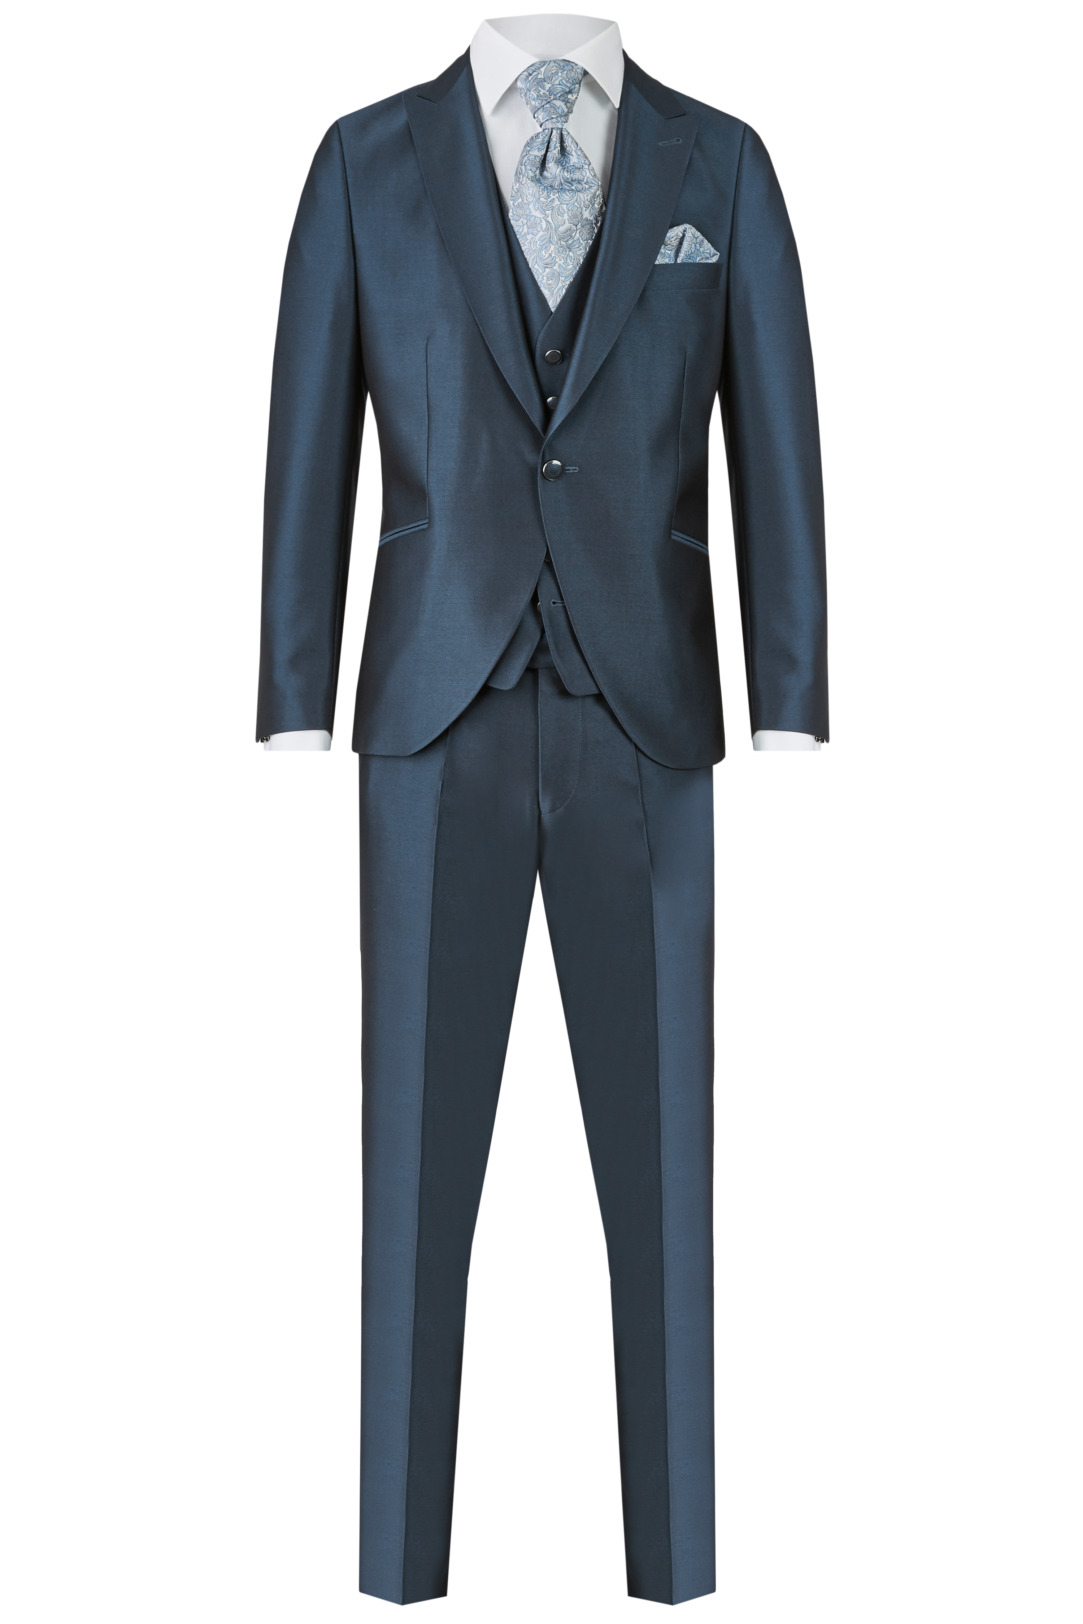 Wilvorst After Six Hochzeitsanzug Männer Mode Bräutigam klassische Form petrol grün wil_0121_otf_as-look-2_1